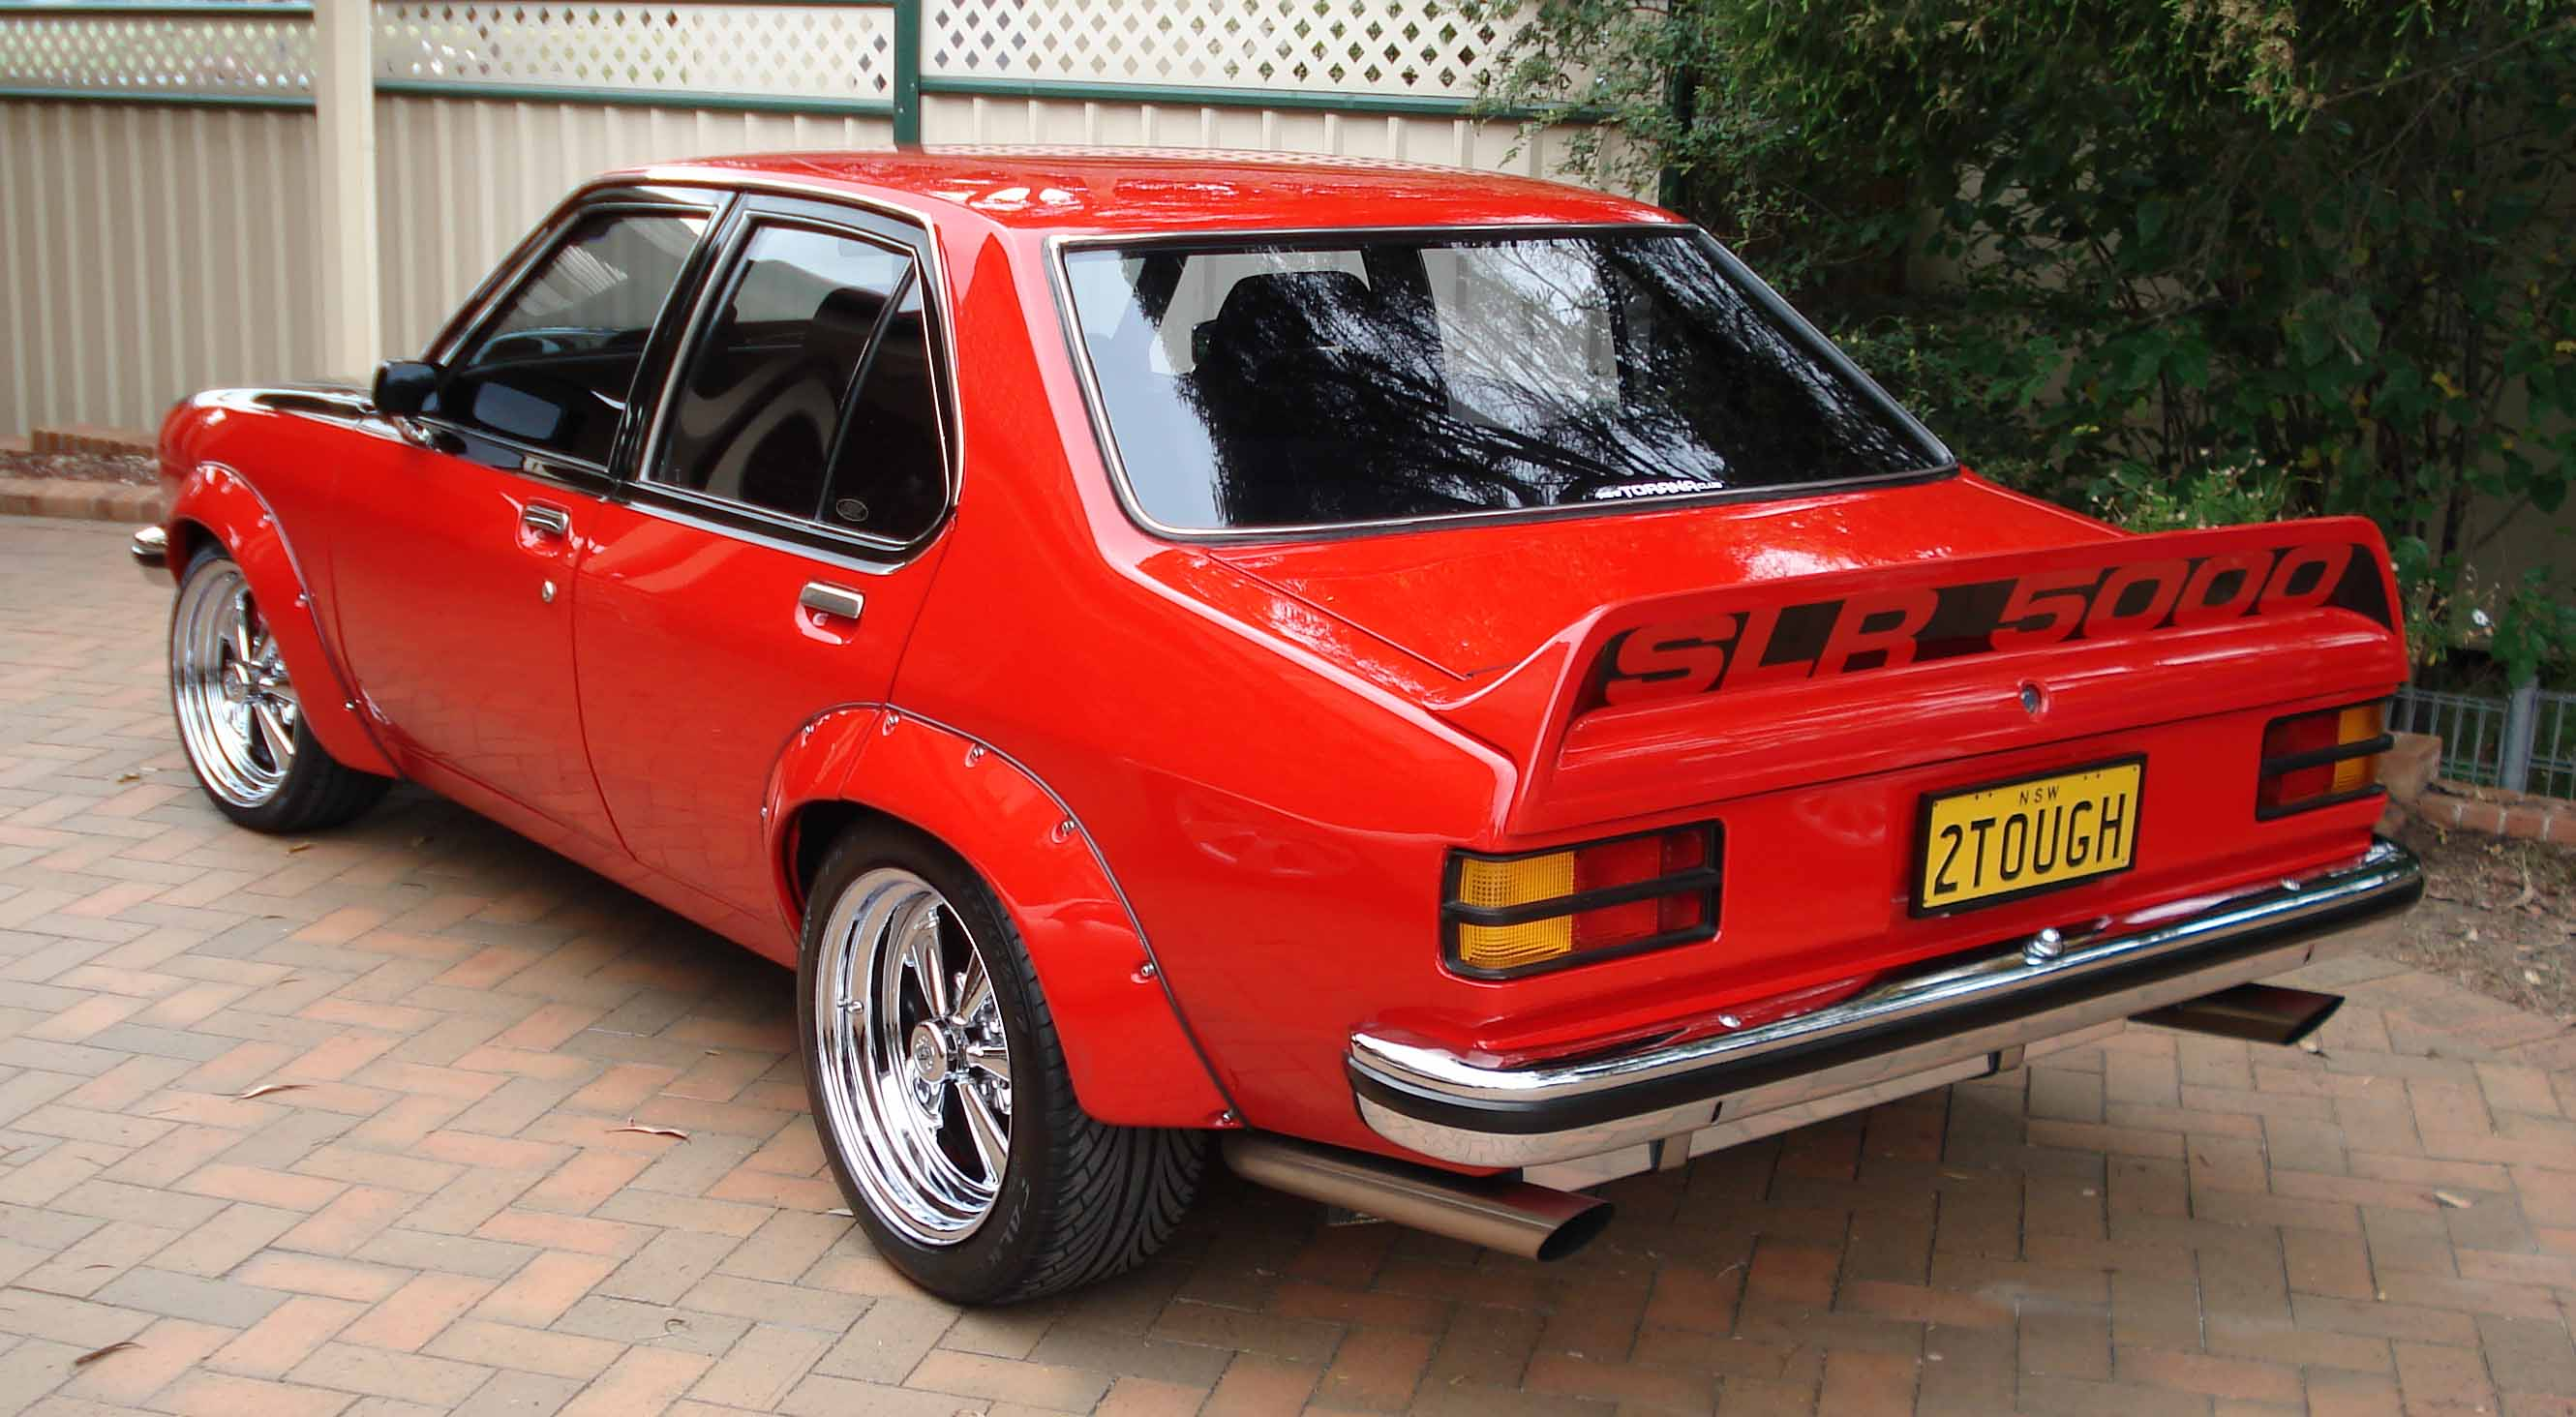 1977_Holden_Torana_%28LX%29_SLR_5000_A9X_sedan_%282006-11-26%29_02.jpg